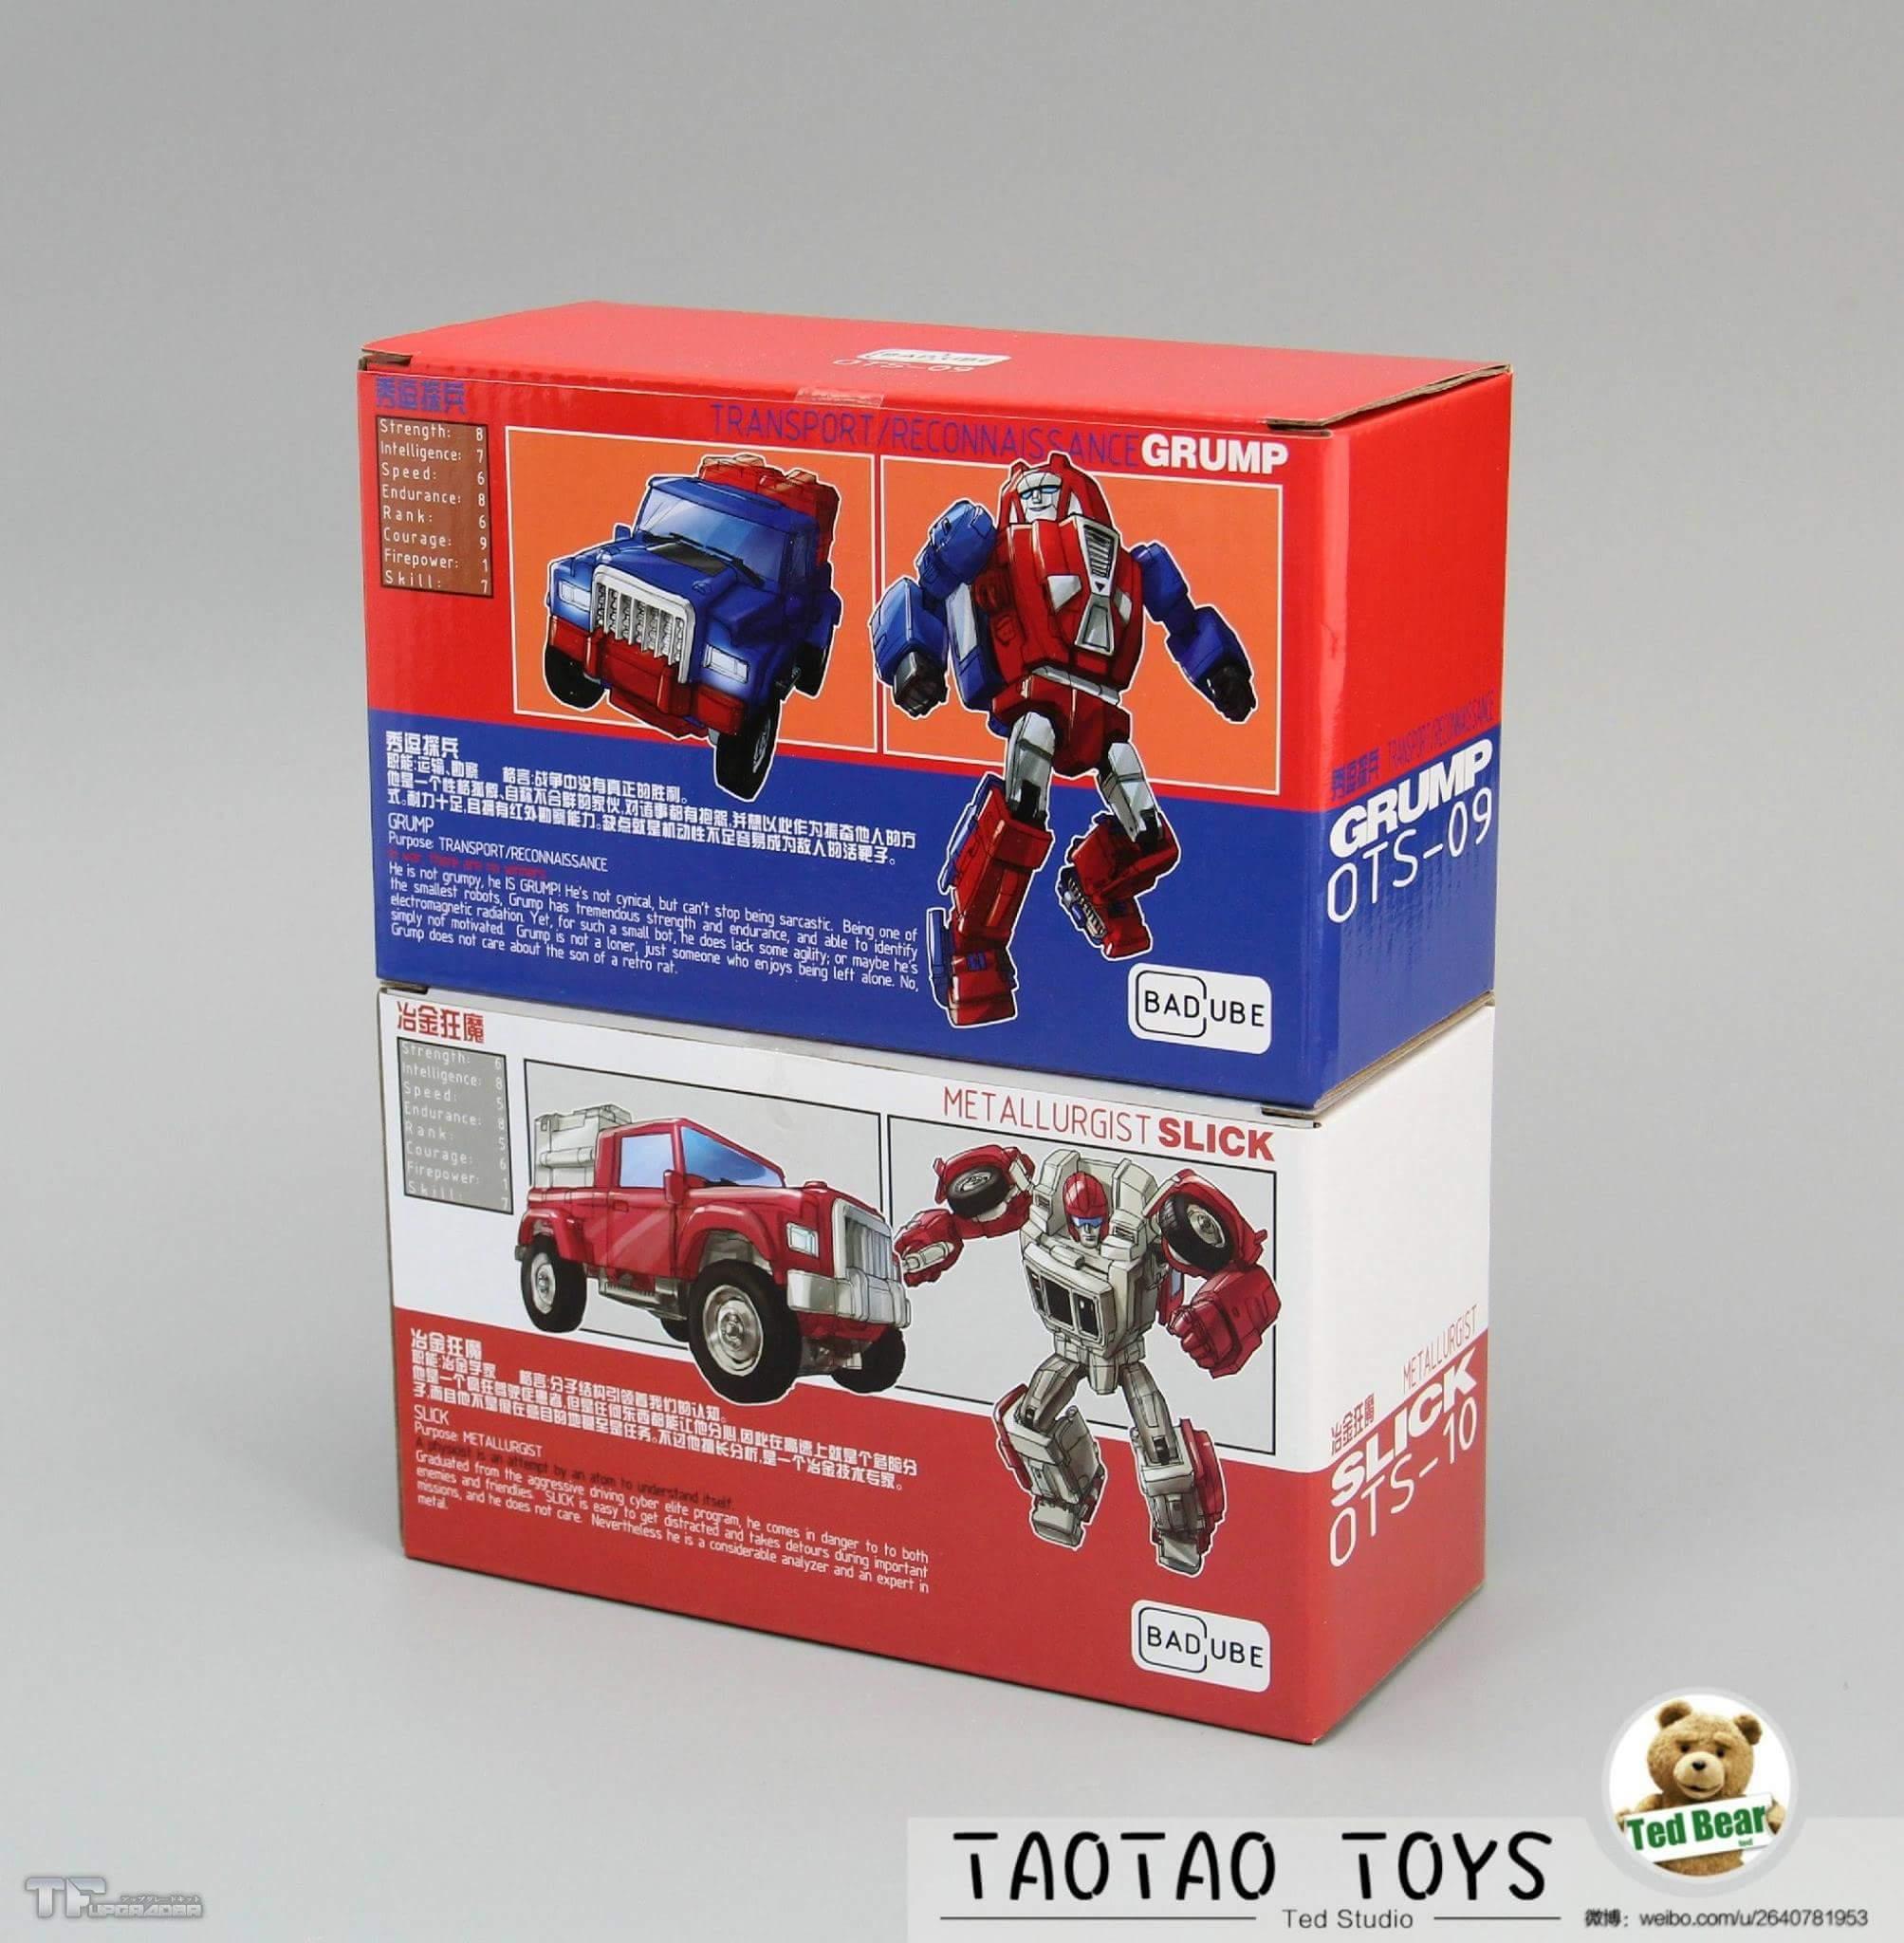 [BadCube] Produit Tiers - Minibots MP - Gamme OTS - Page 5 7k161gXU